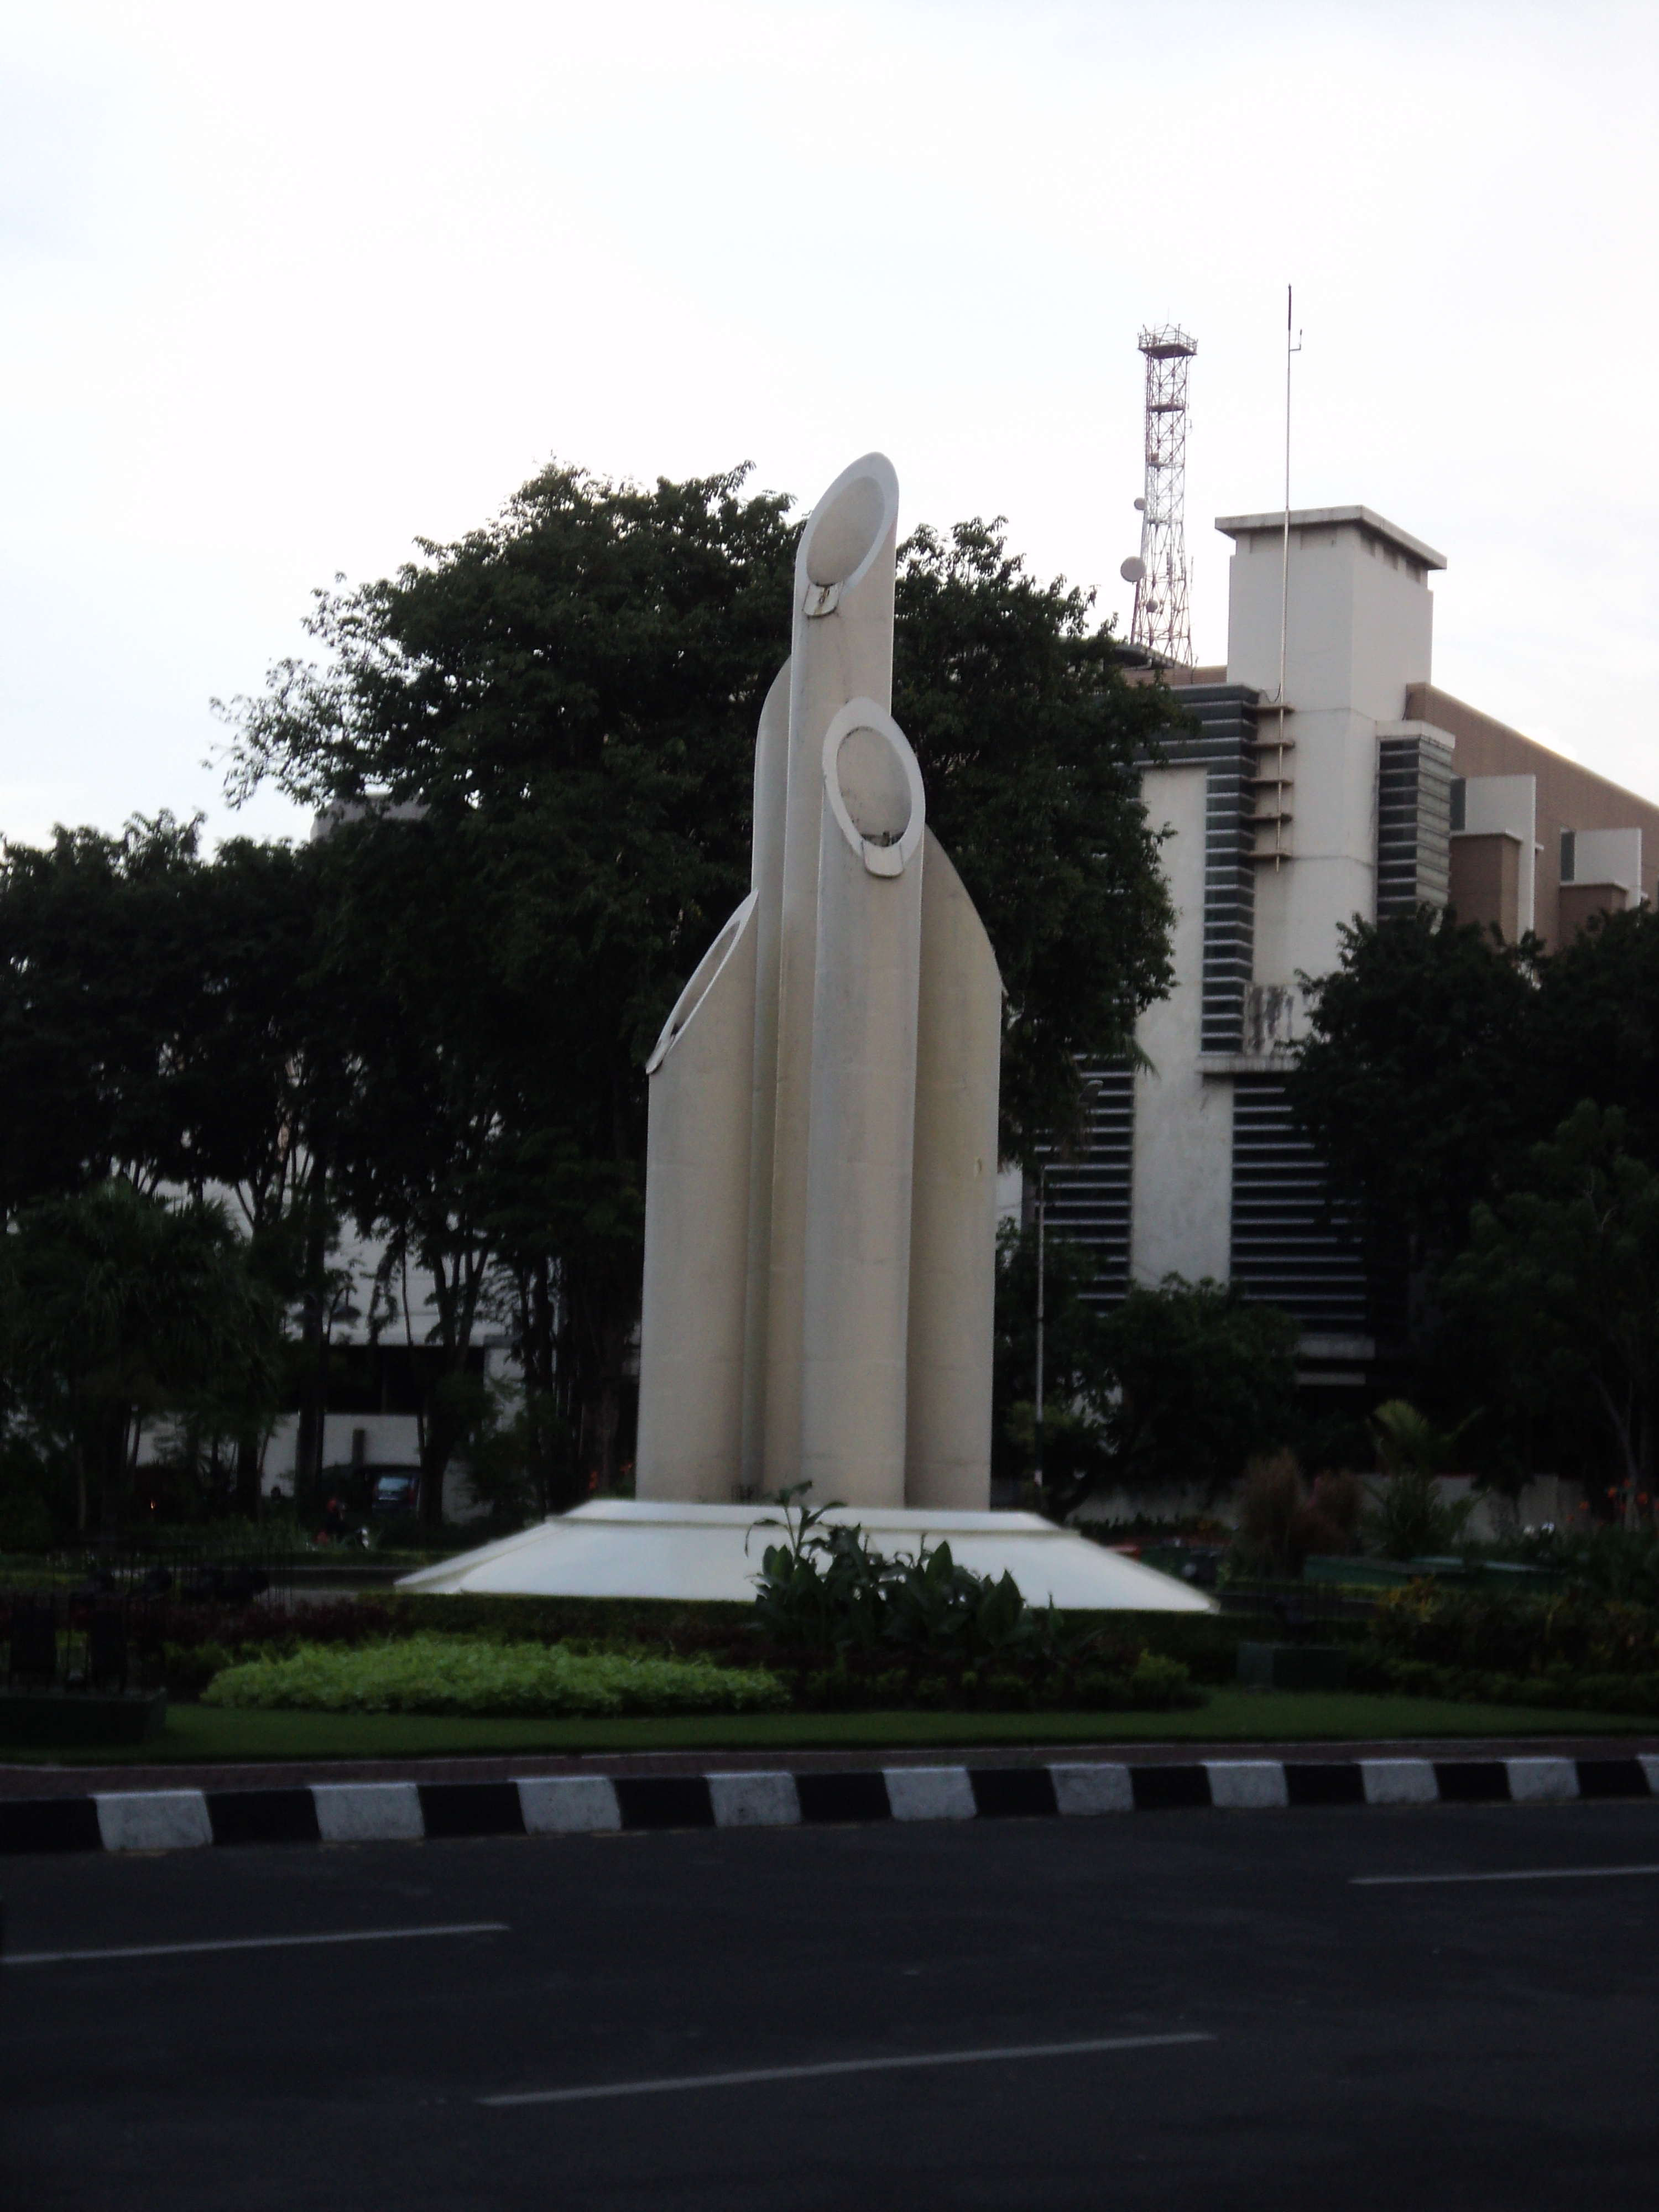 Monumen Bambu Runcing Surabaya Wisata Kota